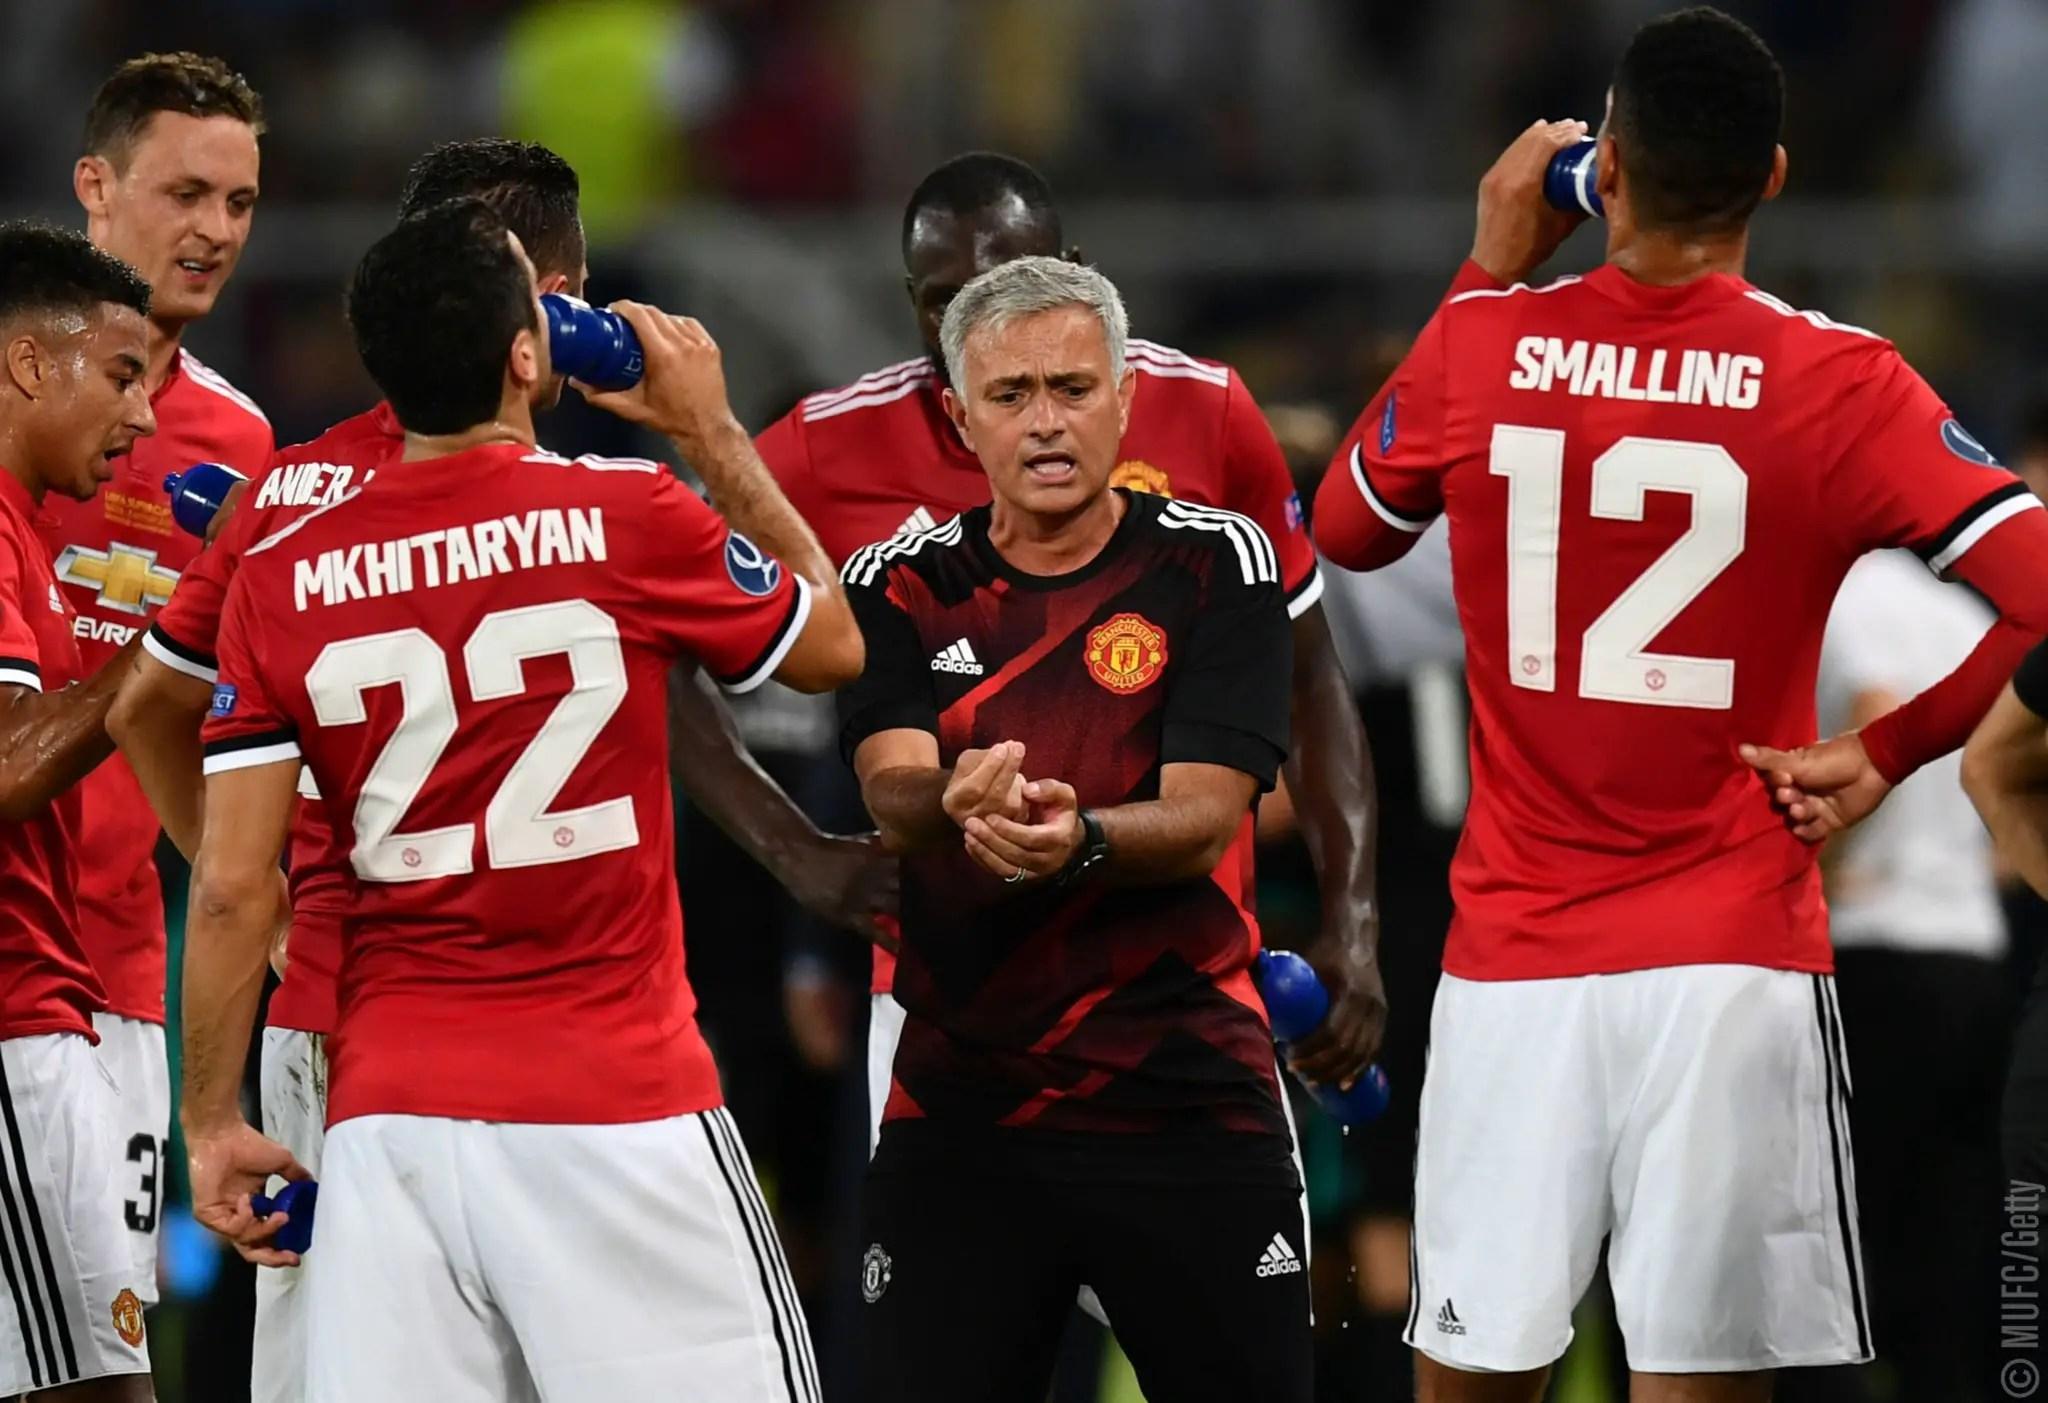 Mourinho On Man United's EPL Title Chances, New Signings, Zlatan Comeback